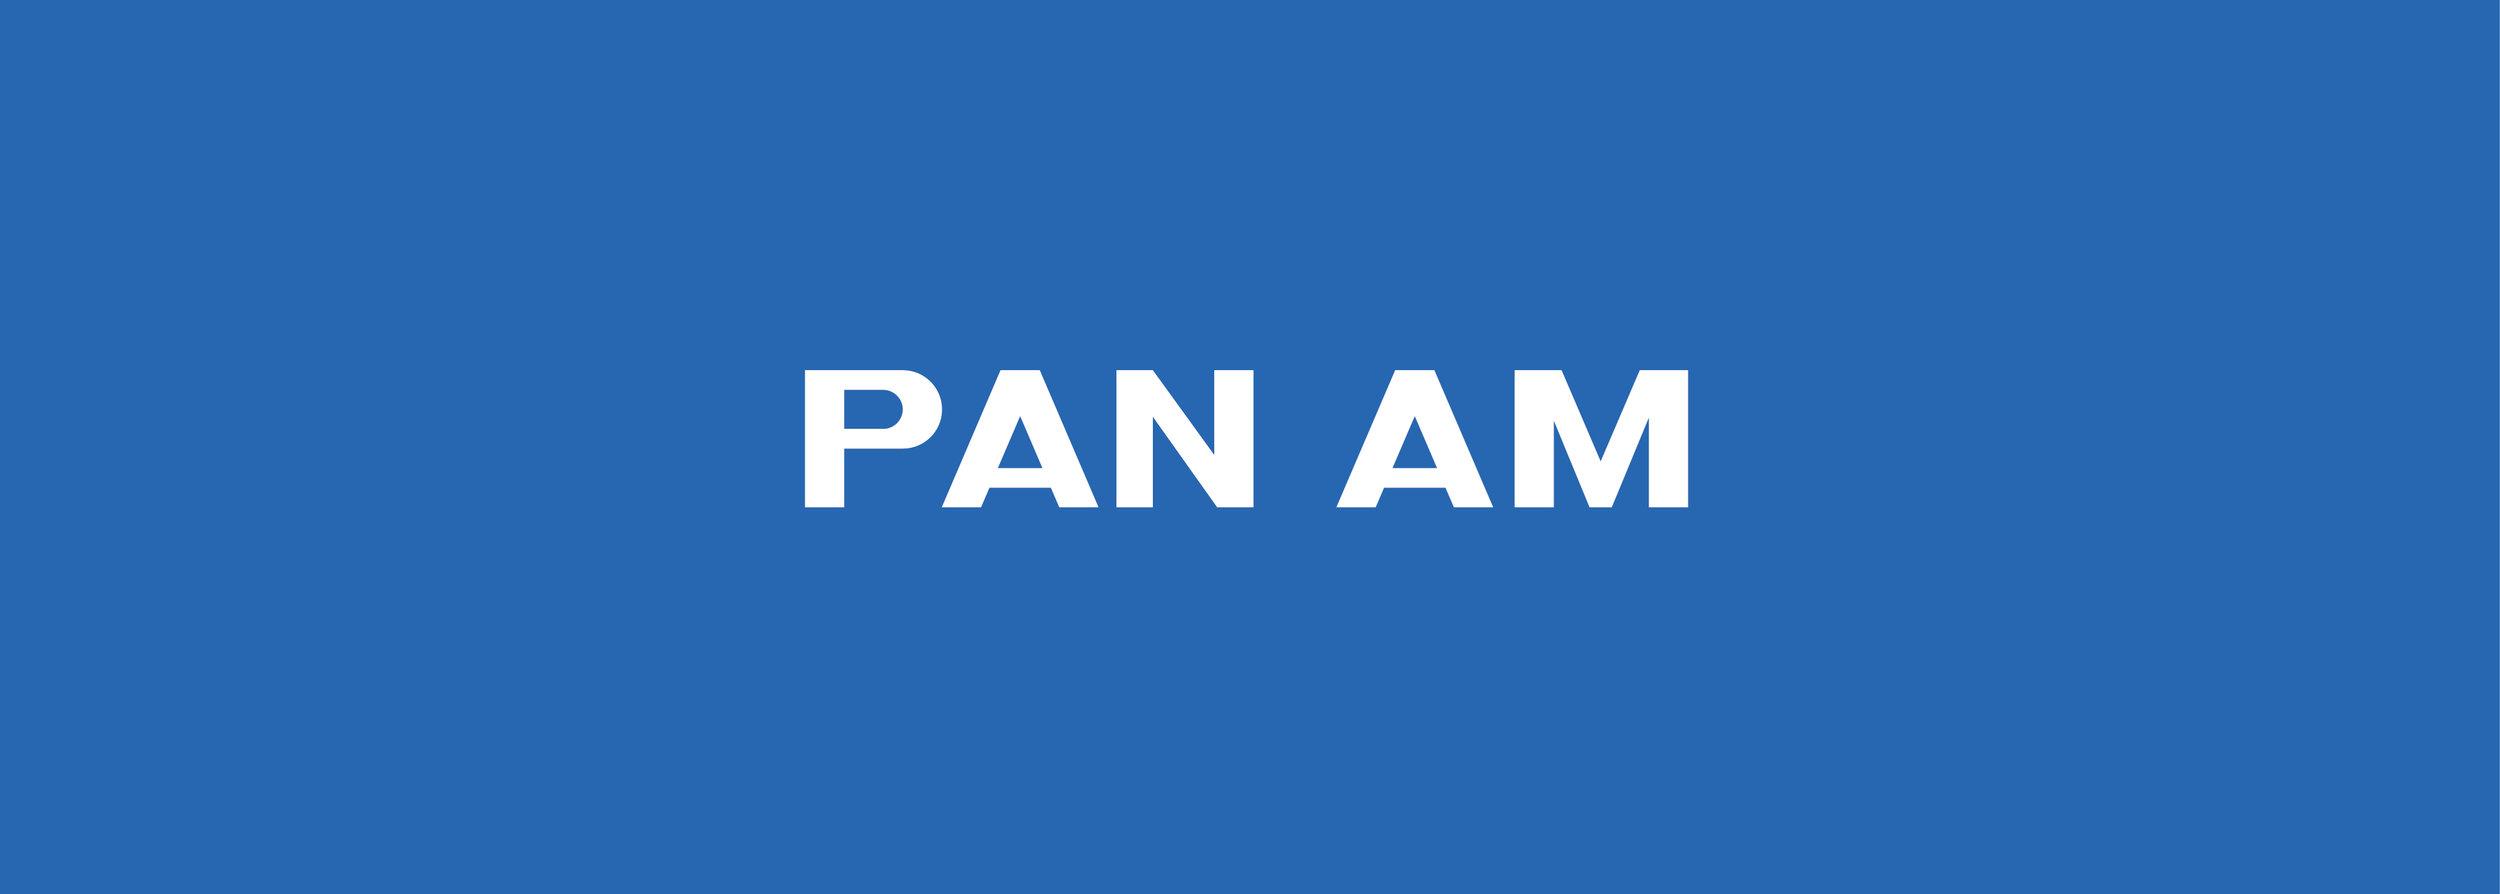 panam_background-06.jpg